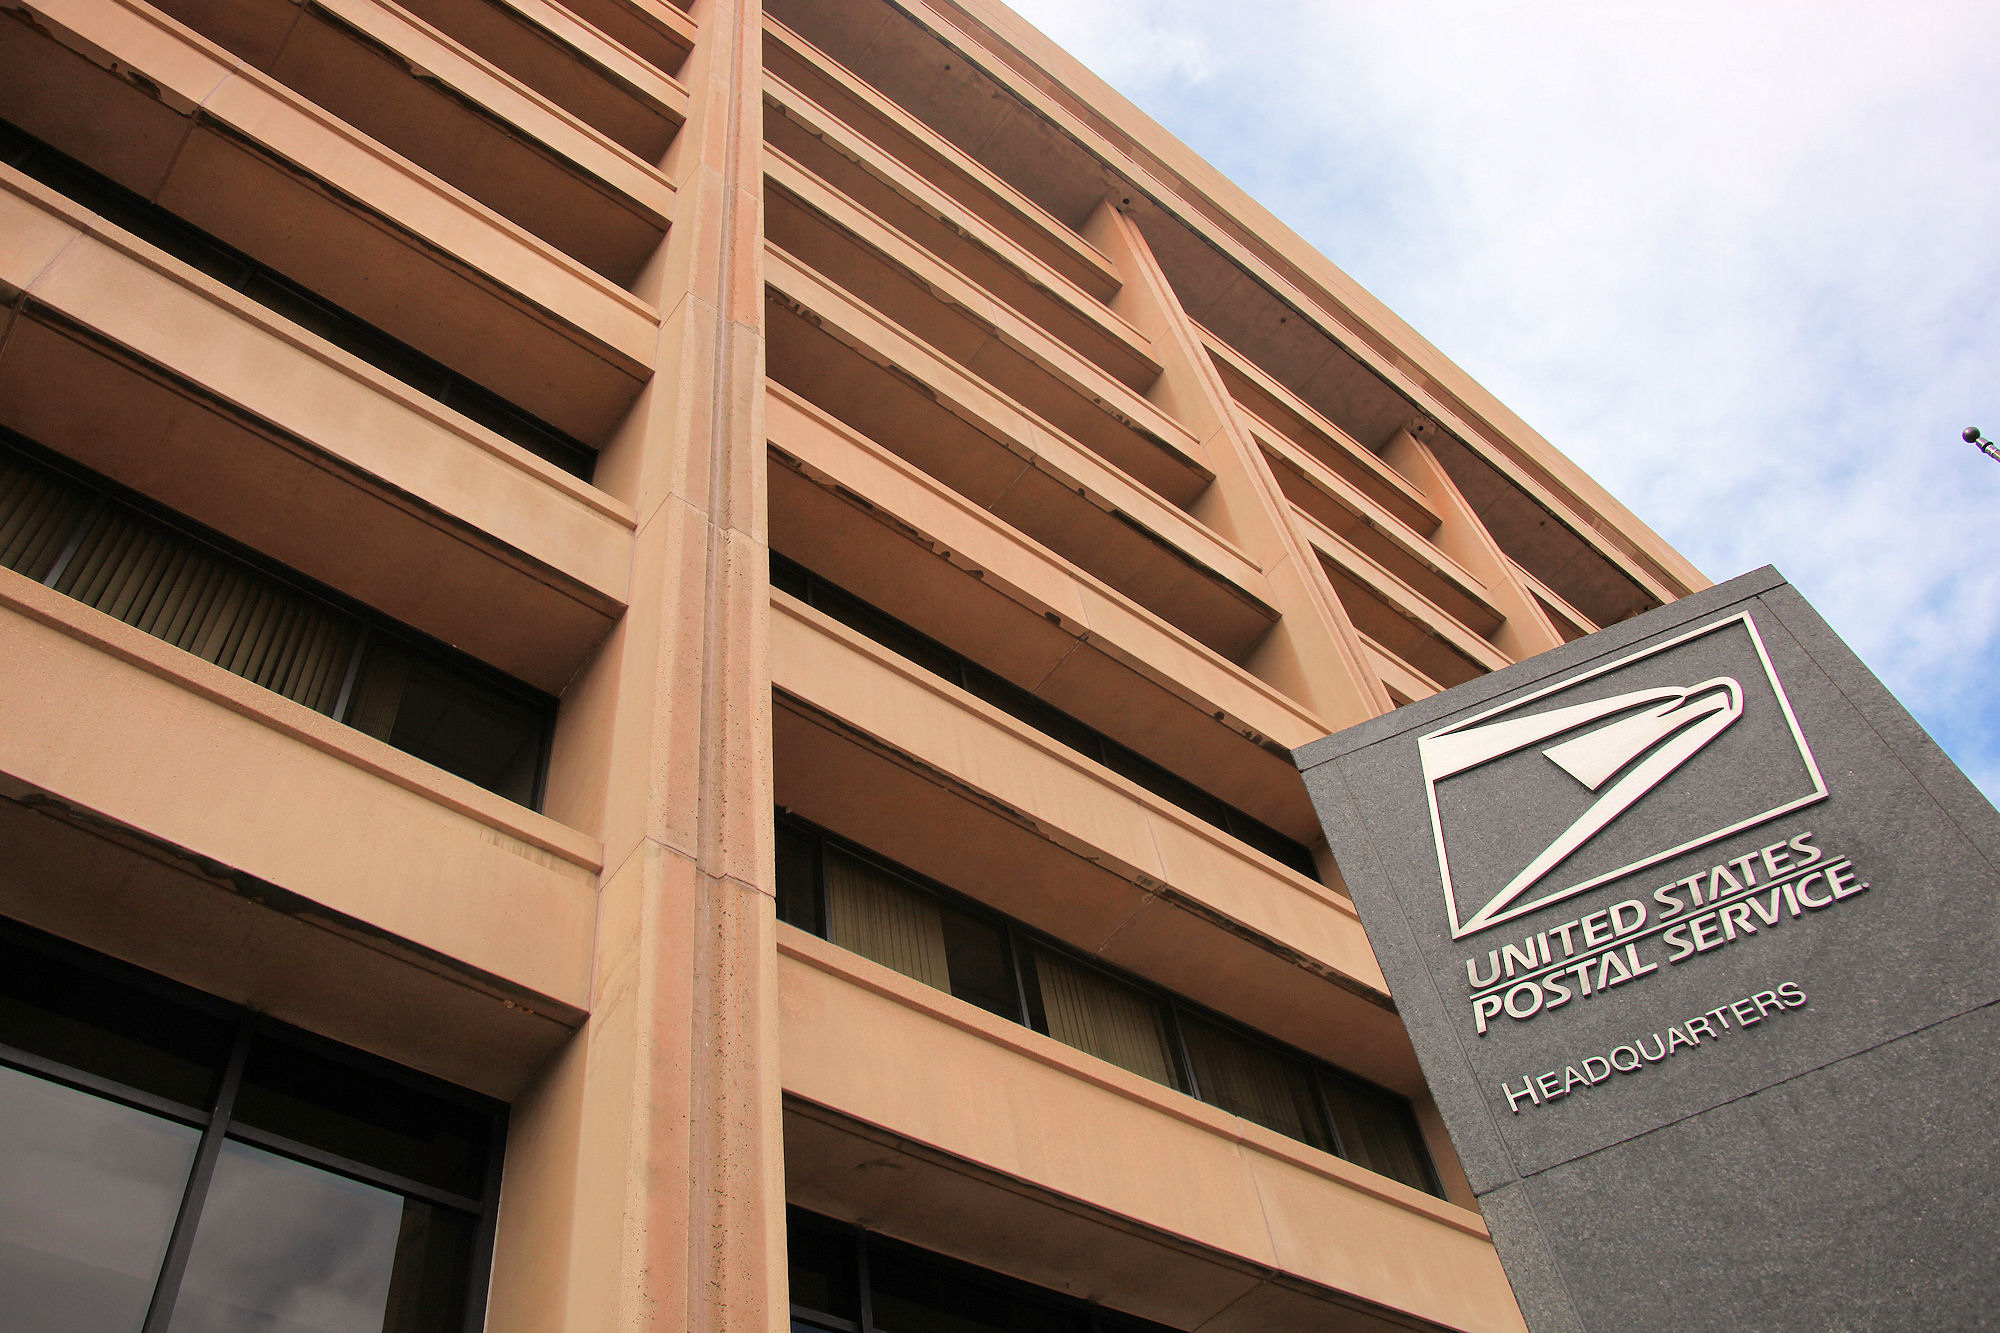 United States Postal Service Neptune City Nj